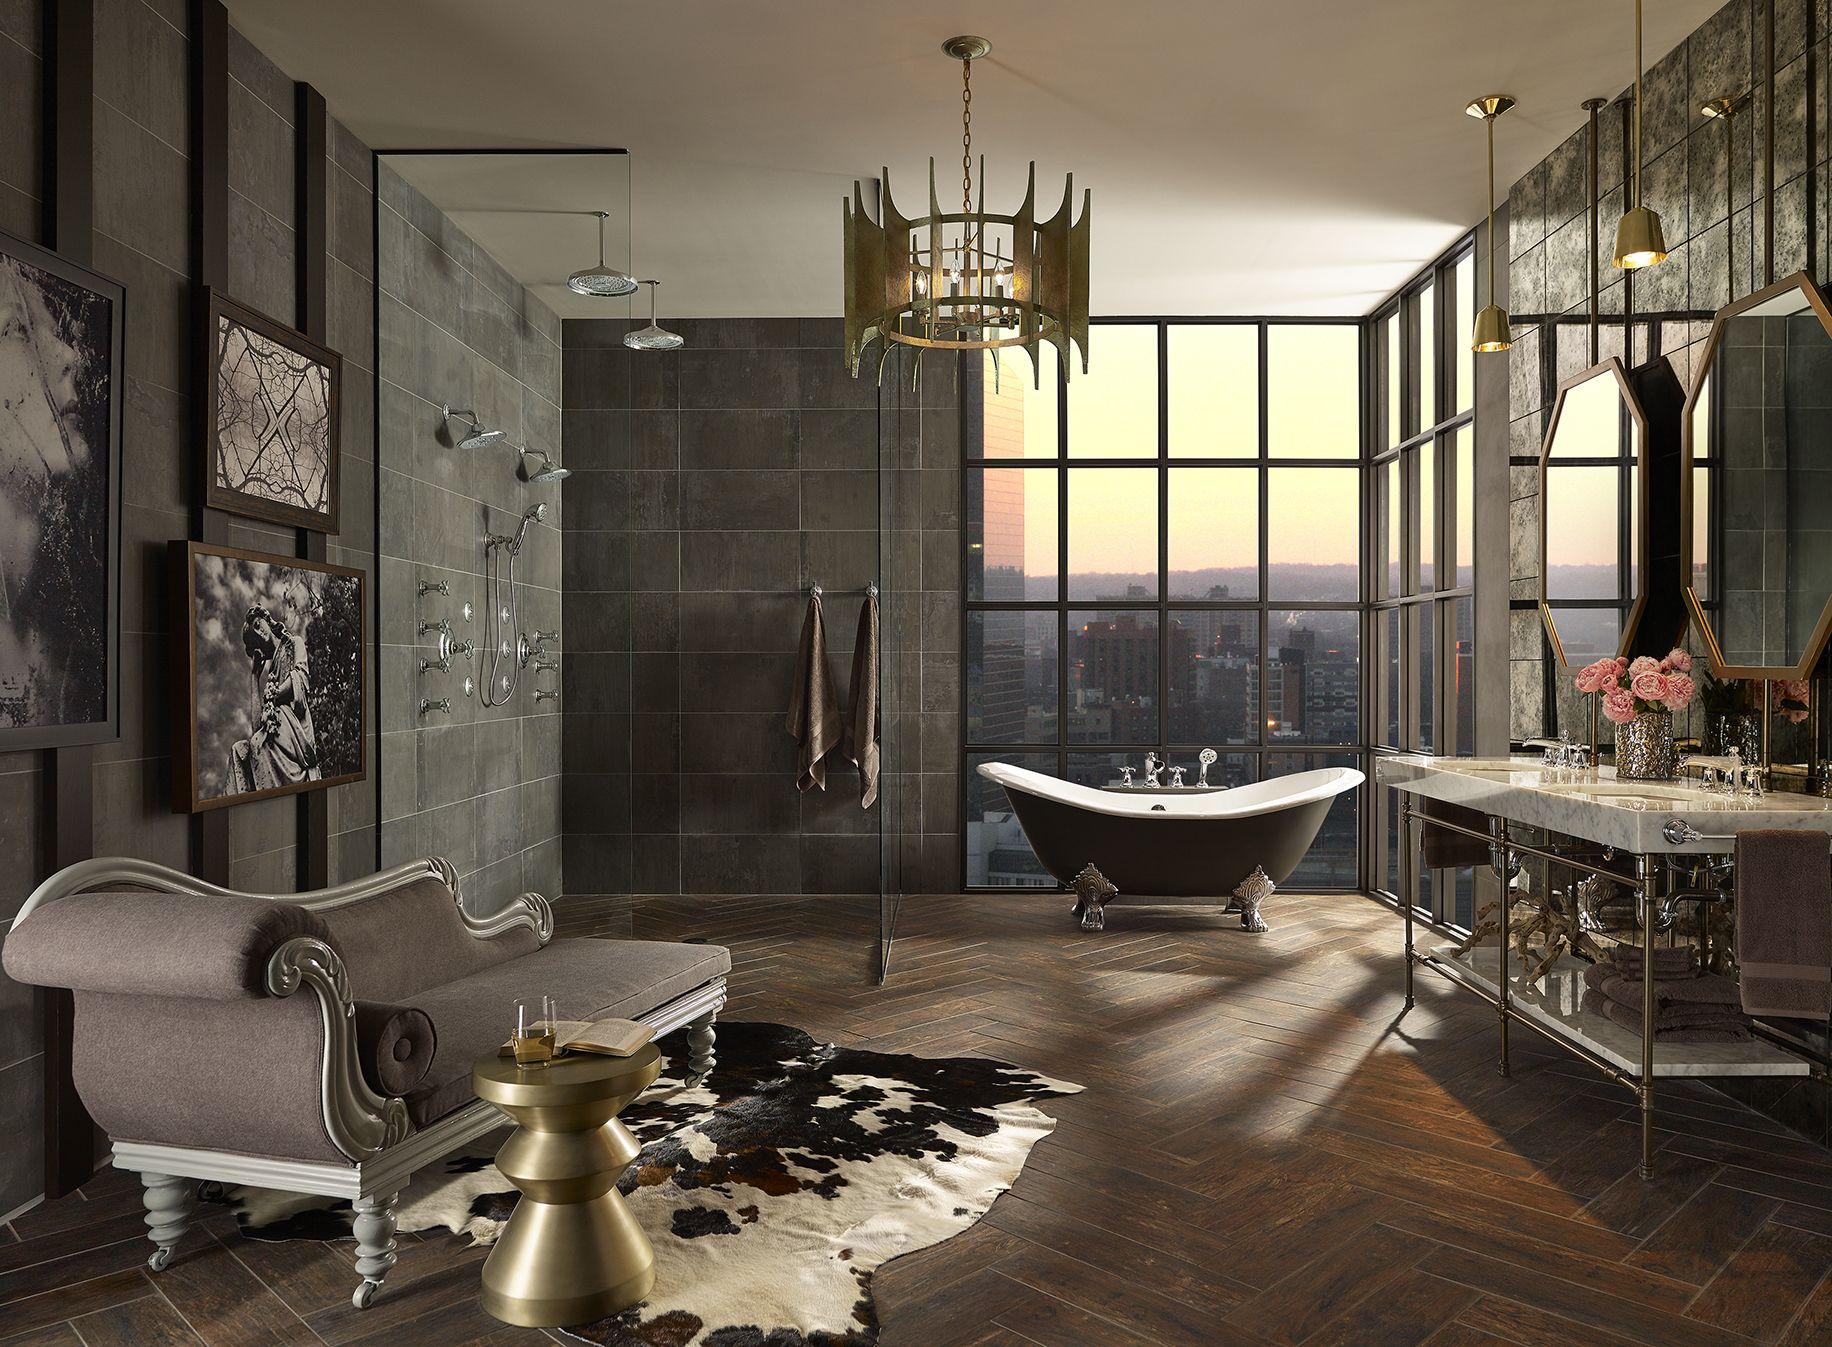 donna mondi interior design dmdi eclectic bathroombathroom - Eclectic Bathroom Interior